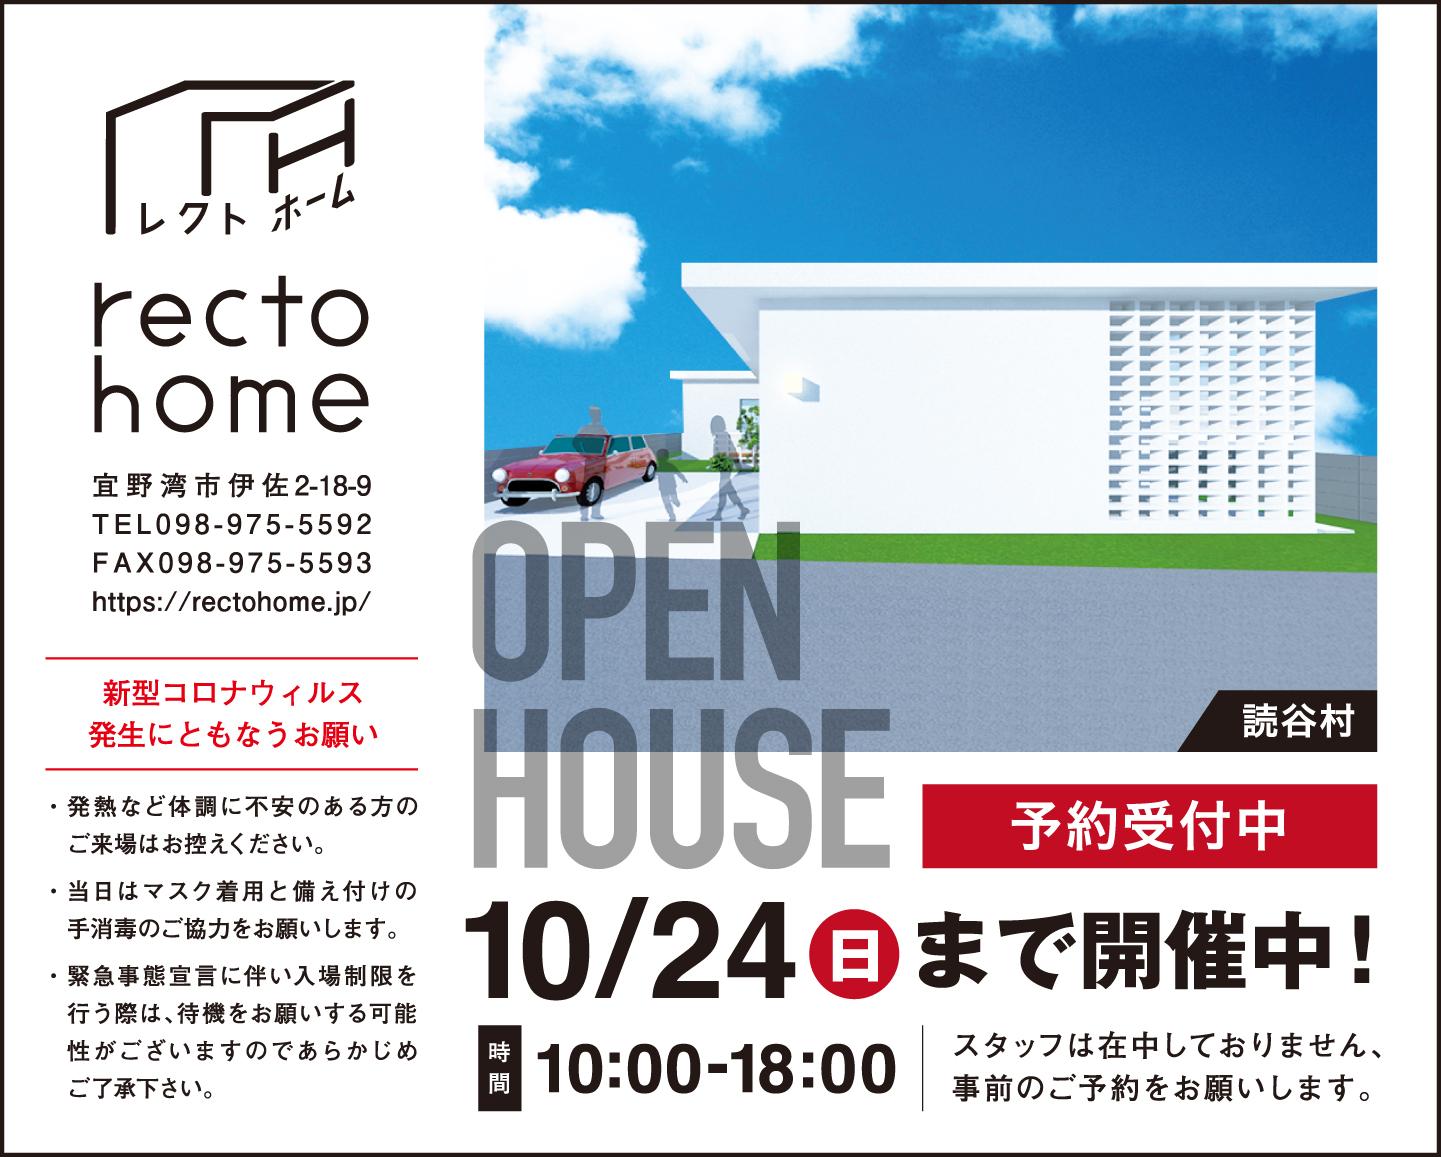 recto homeが読谷村でOPEN HOUSE 10/24(日)まで開催中!